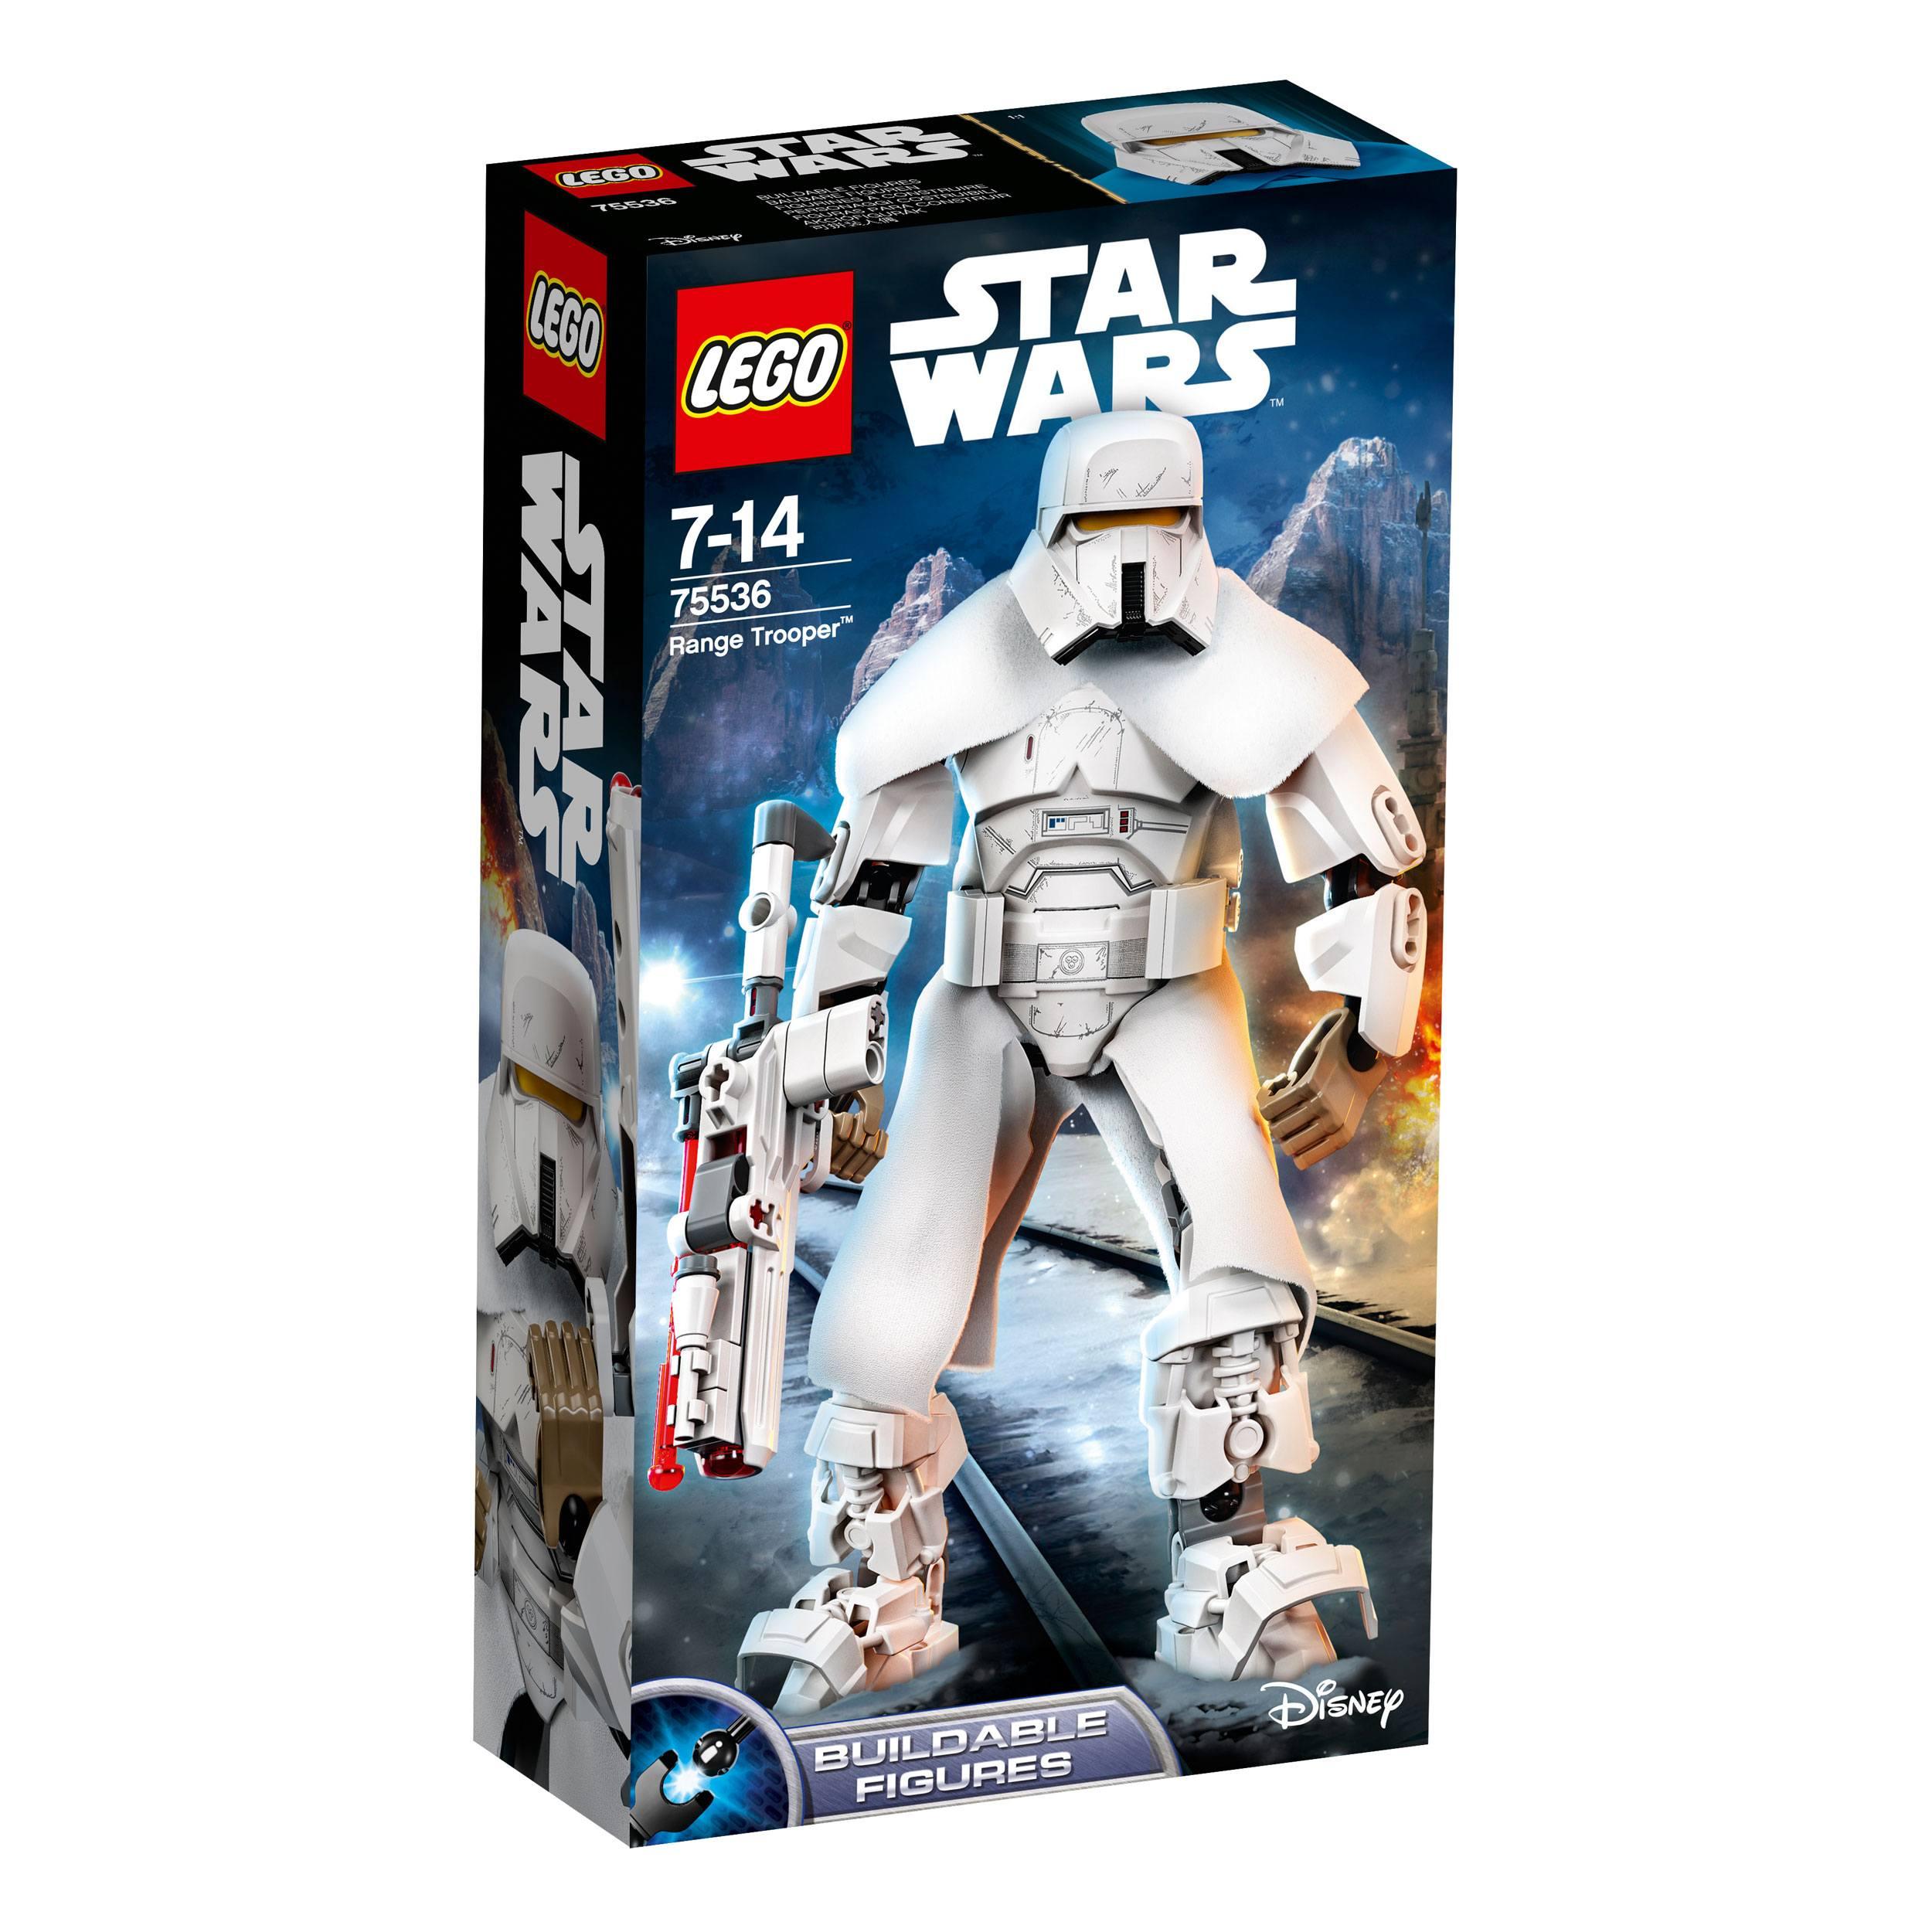 Lego Star Wars Solo Action Figure Range Trooper 24 Cm Animegami Store